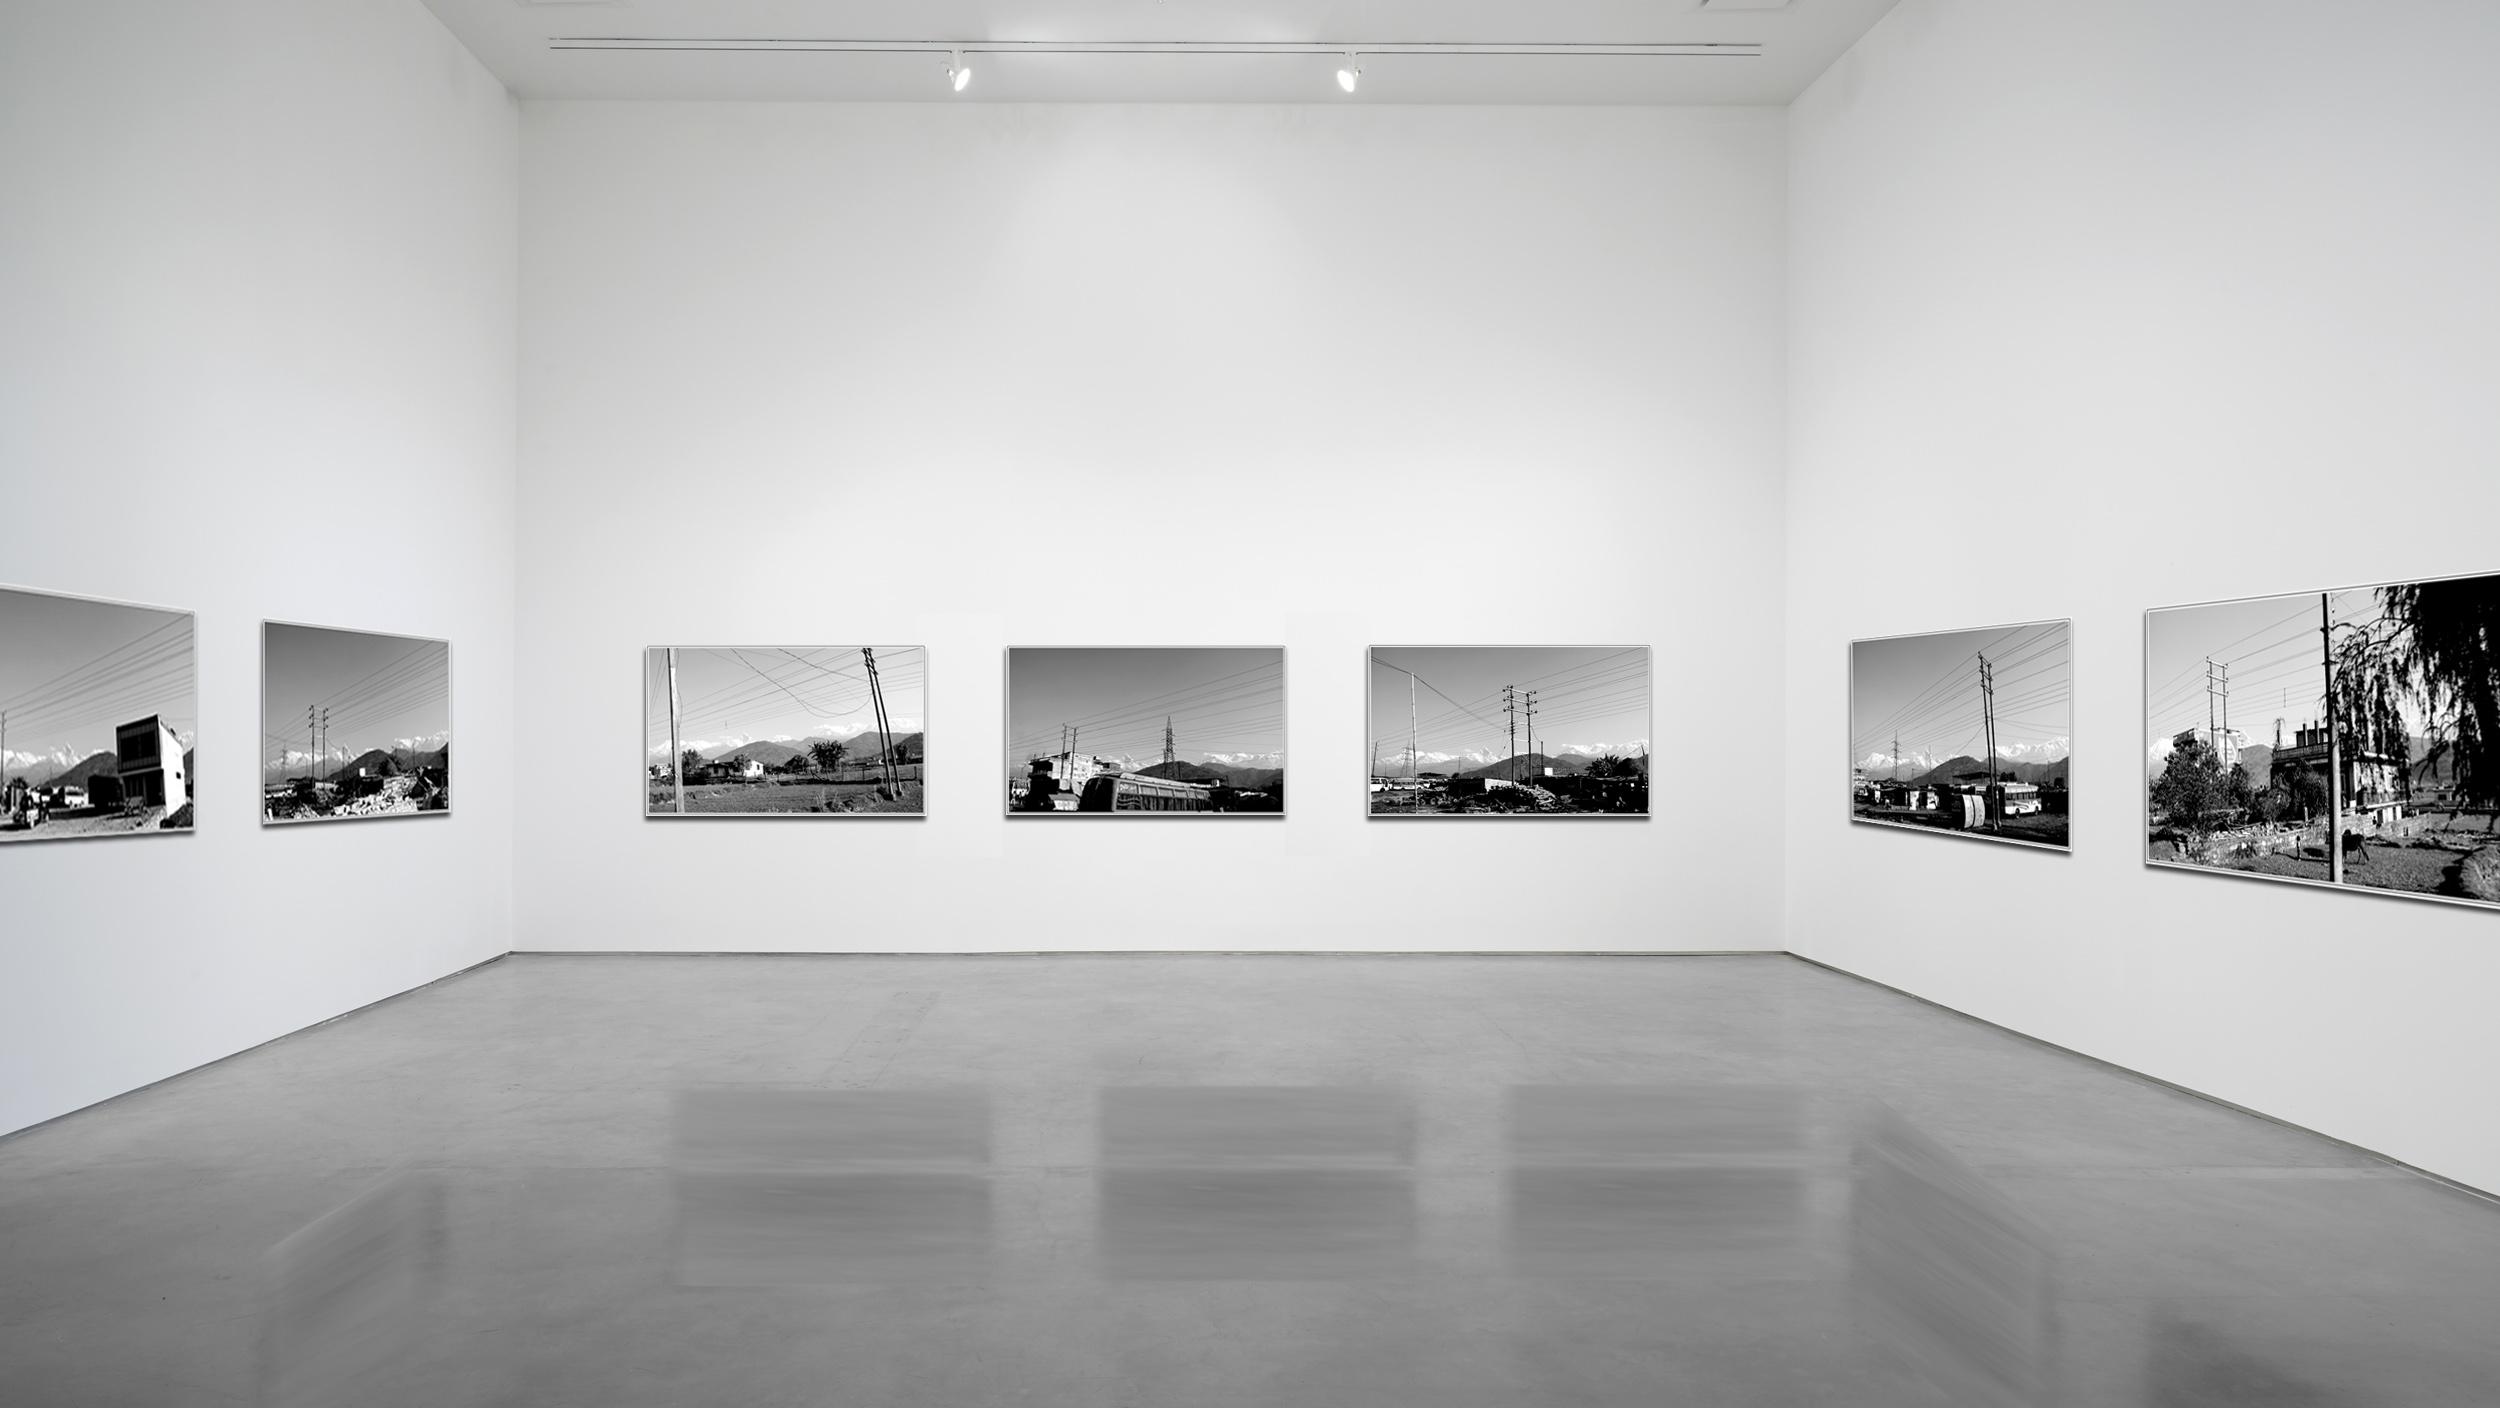 Bus flux -  Nagarkot -  2012 - Photography - 60 x 40 cm